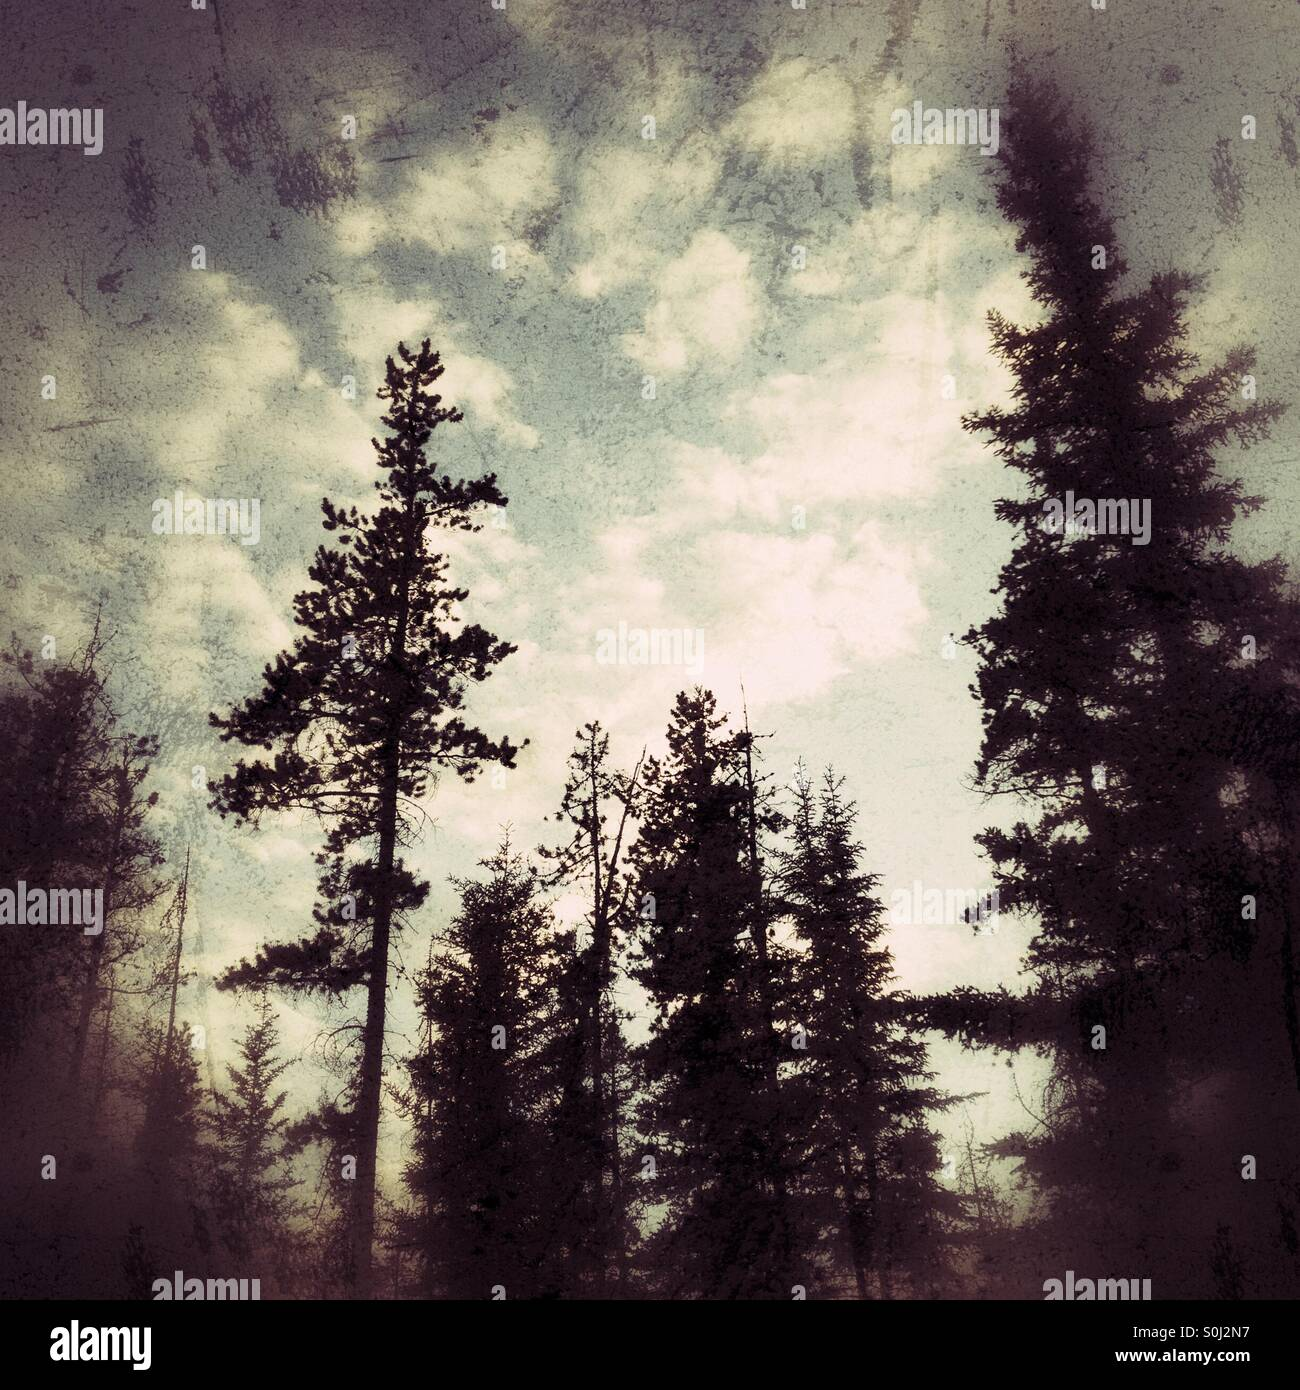 Bäume-silhouette Stockbild